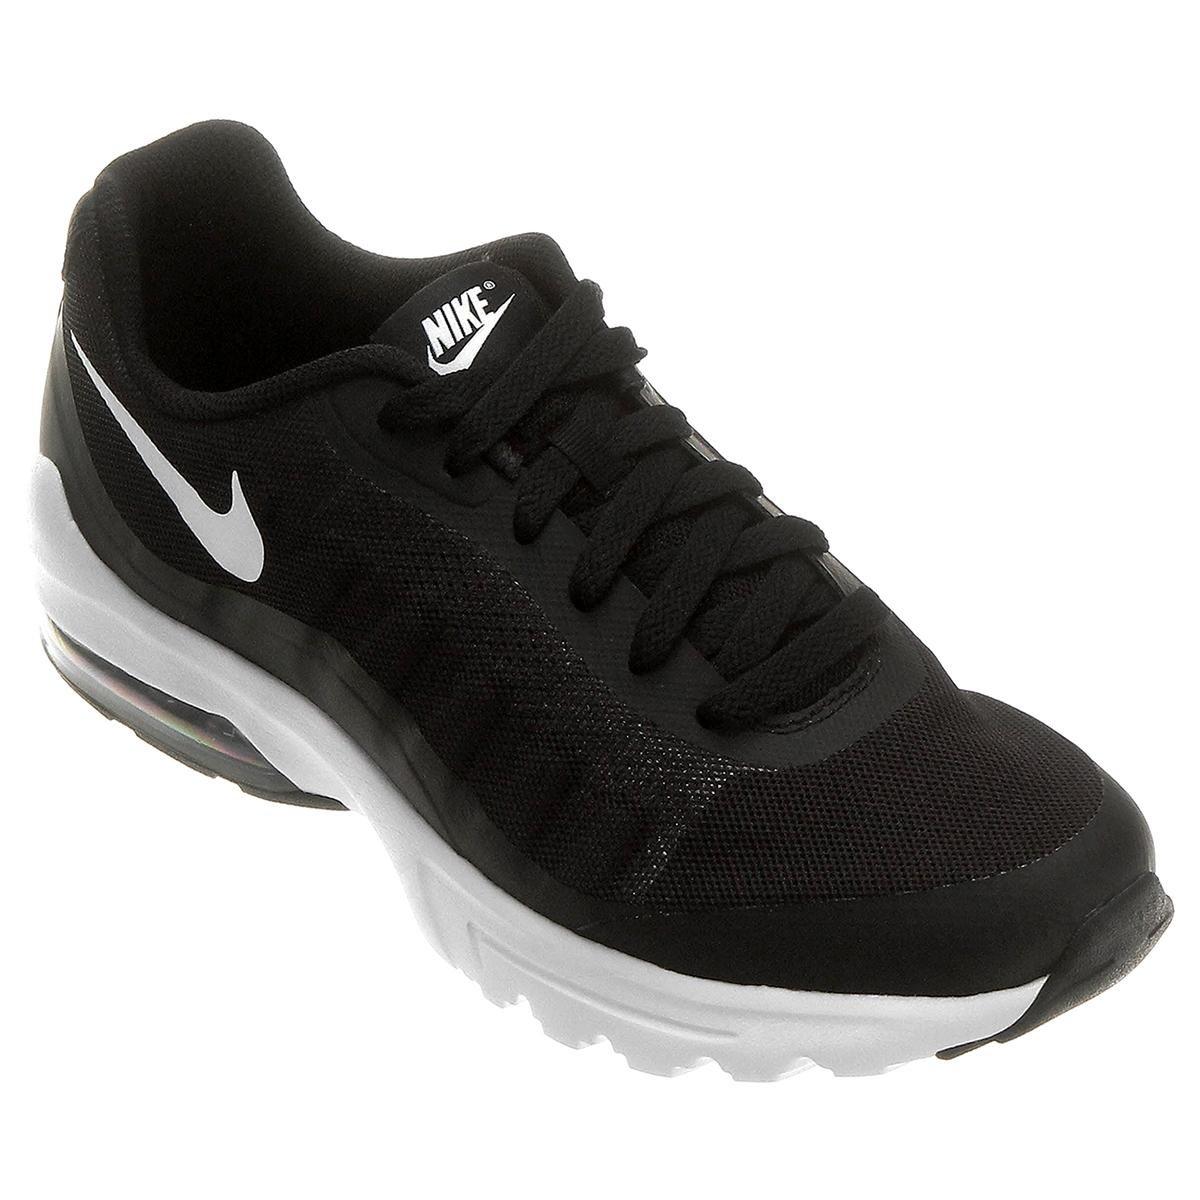 low priced 11d79 9ea84 Tênis Nike Air Max Invigor Masculino - Preto e Branco - Compre Agora   Netshoes